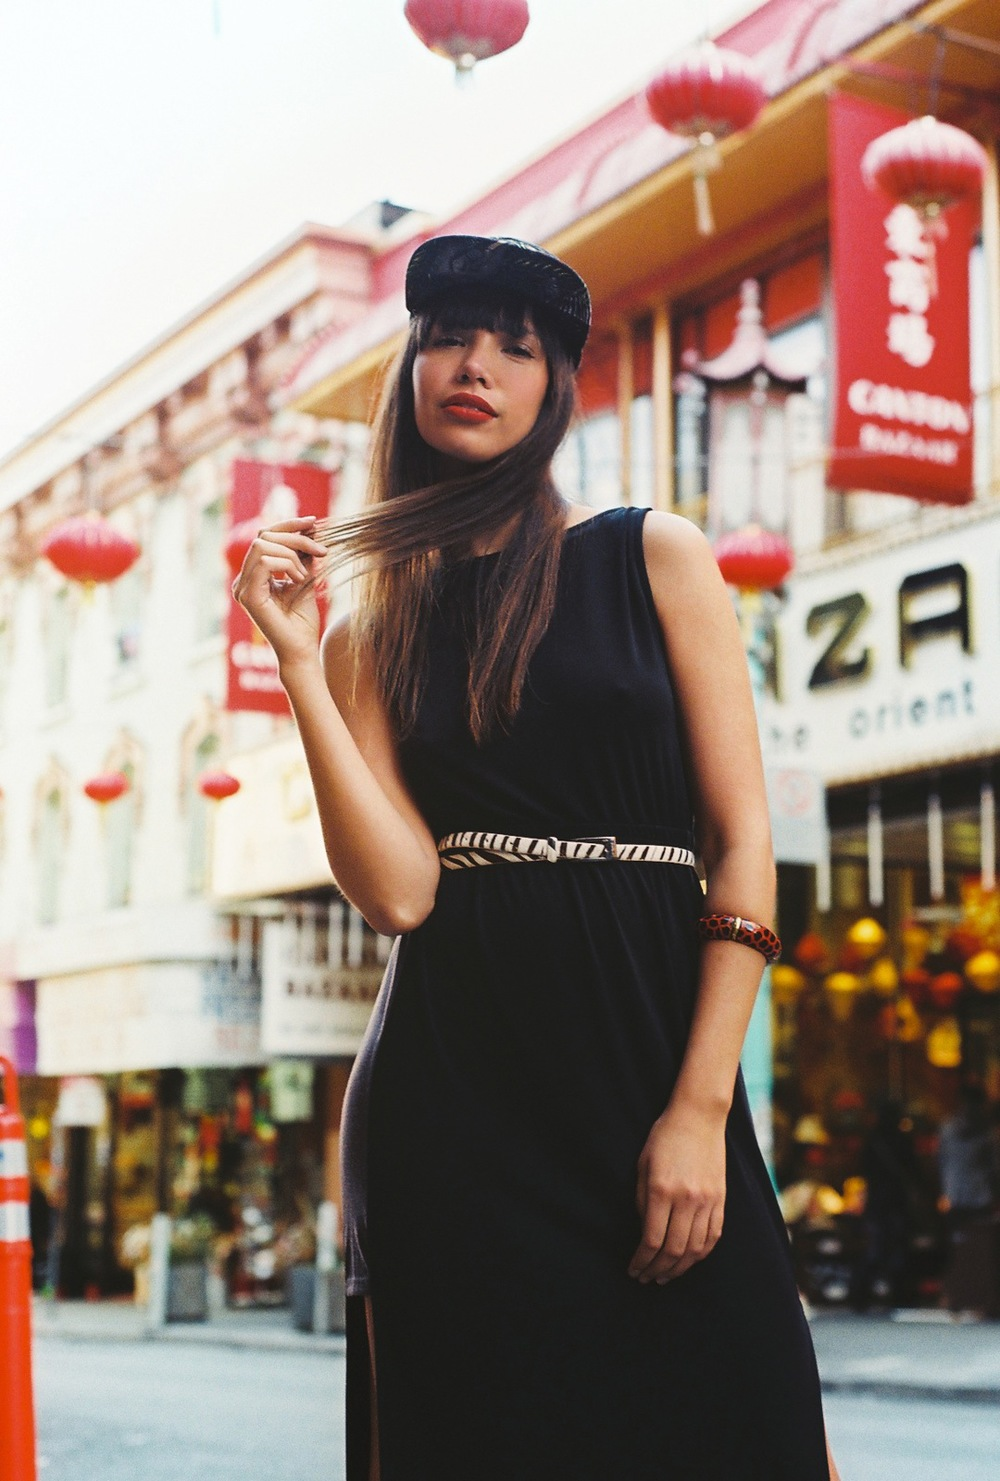 Model + Stylist + Co-Producer  Shot by Julian Edwards